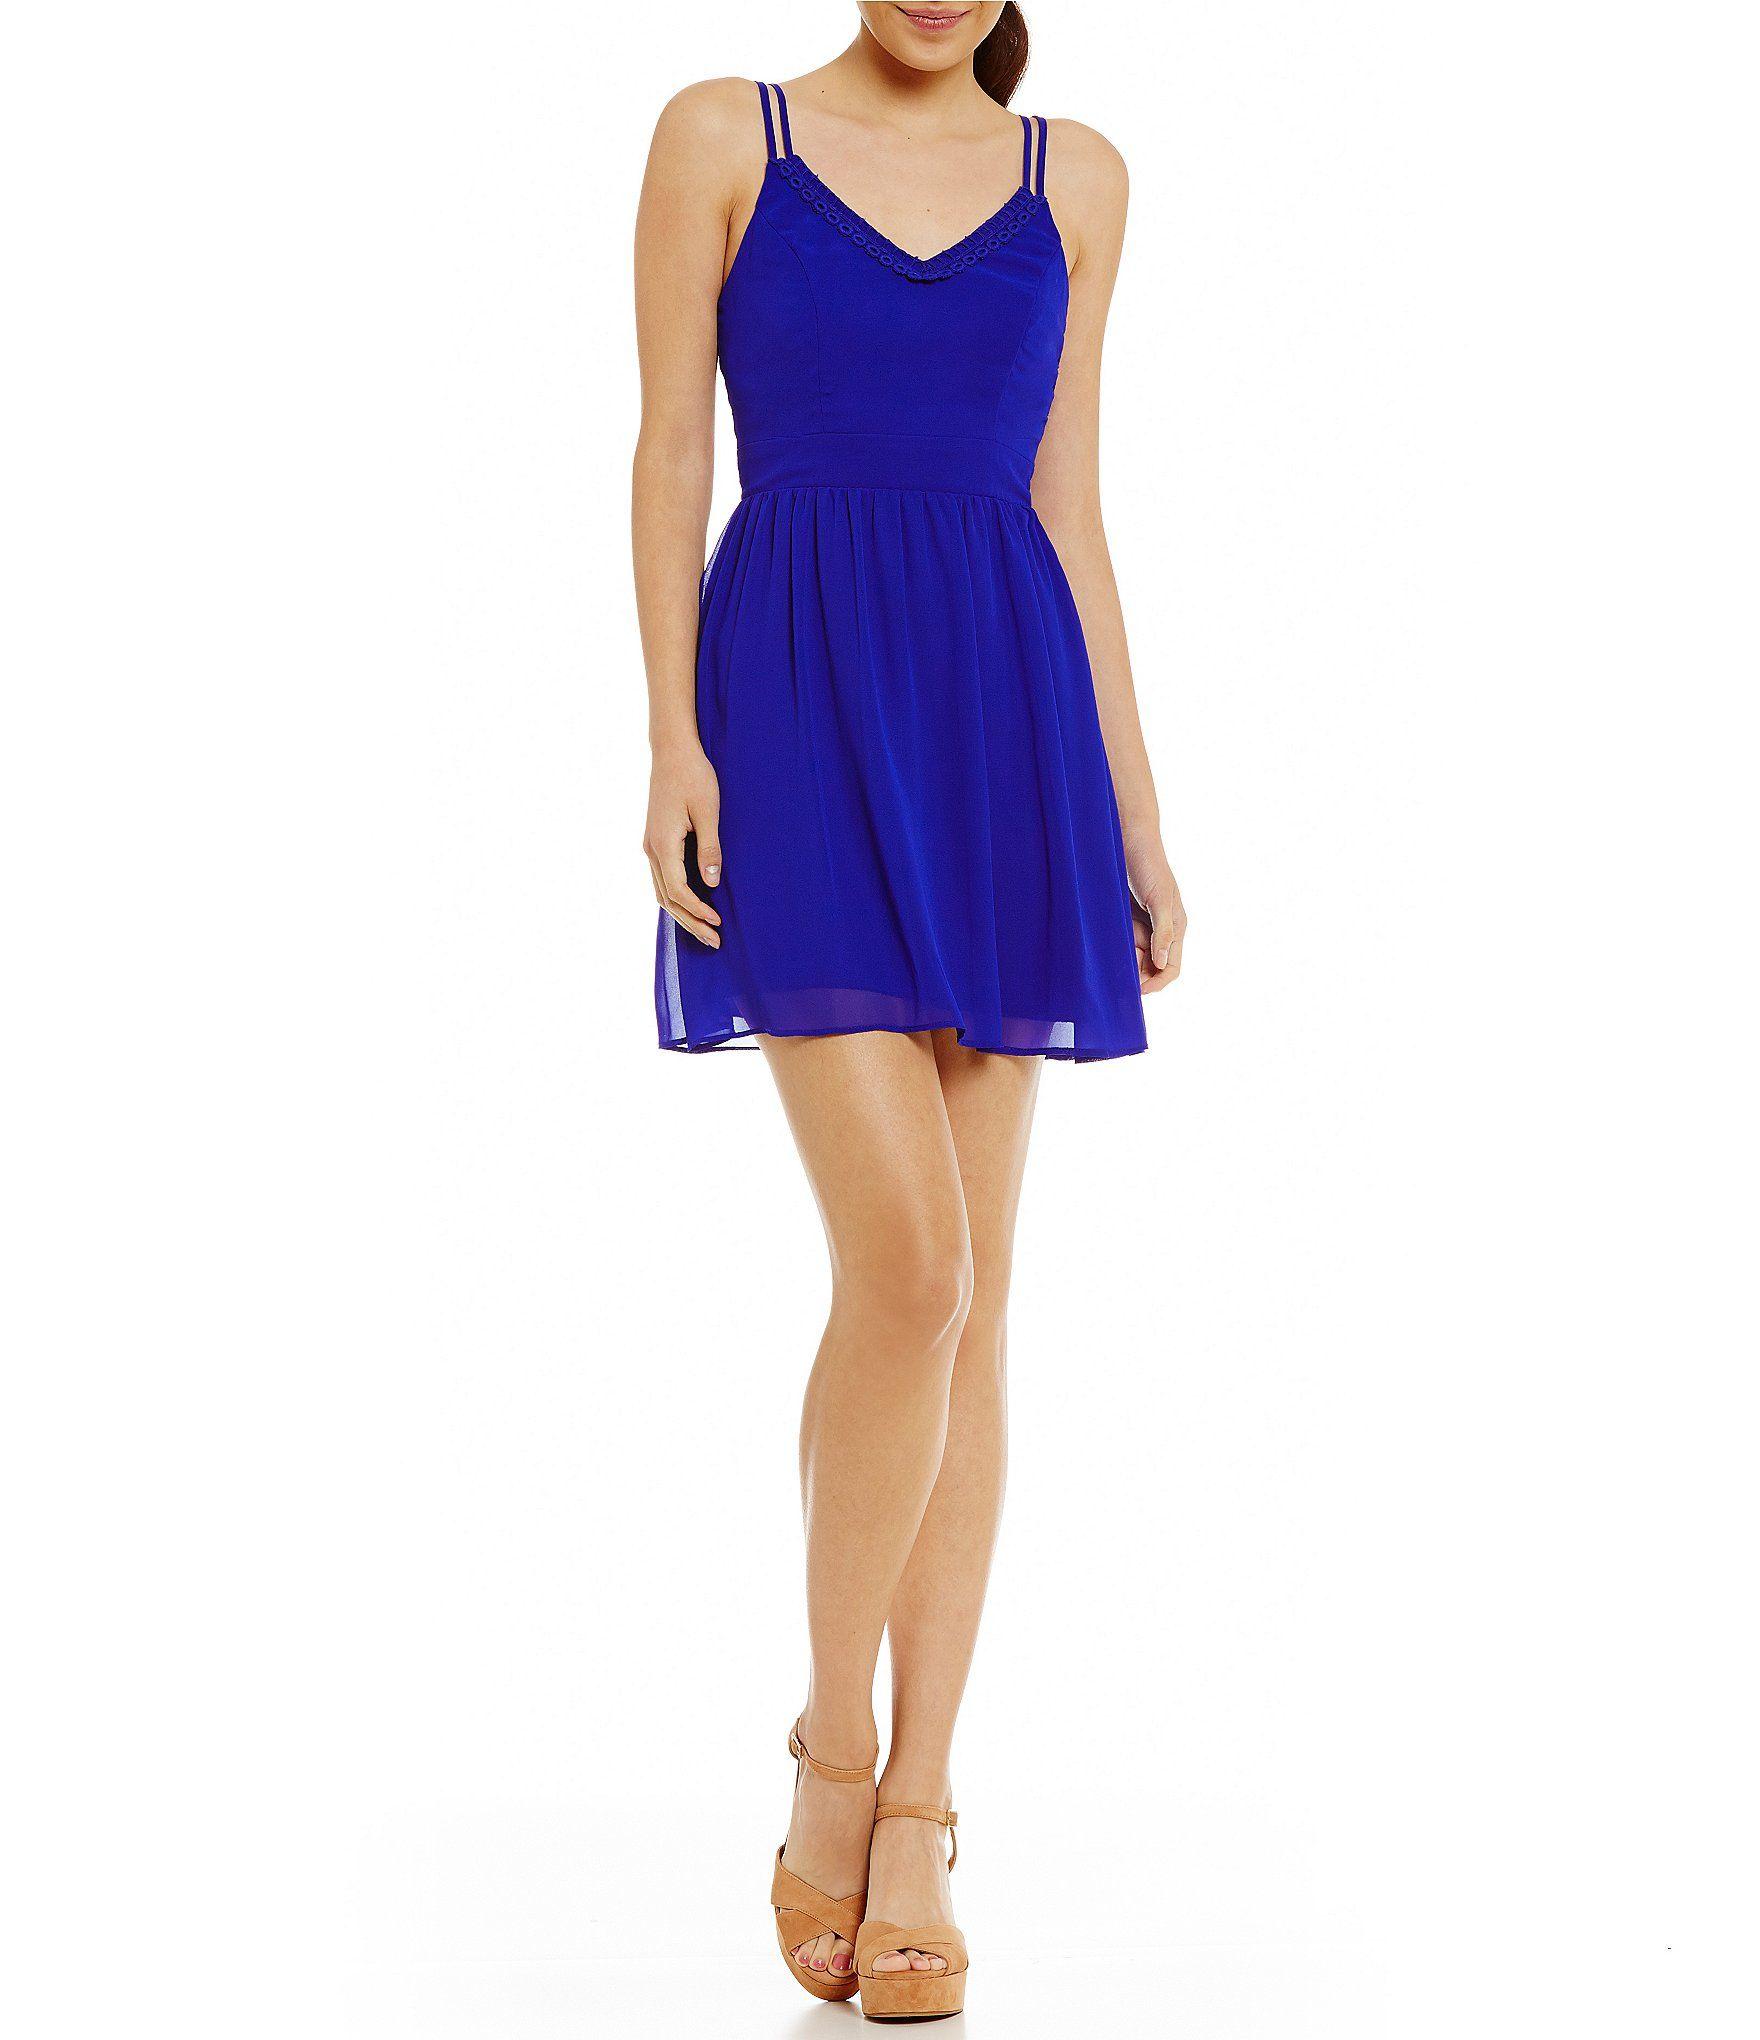 Shop for b darlin doublestrap fitandflare dress at dillards